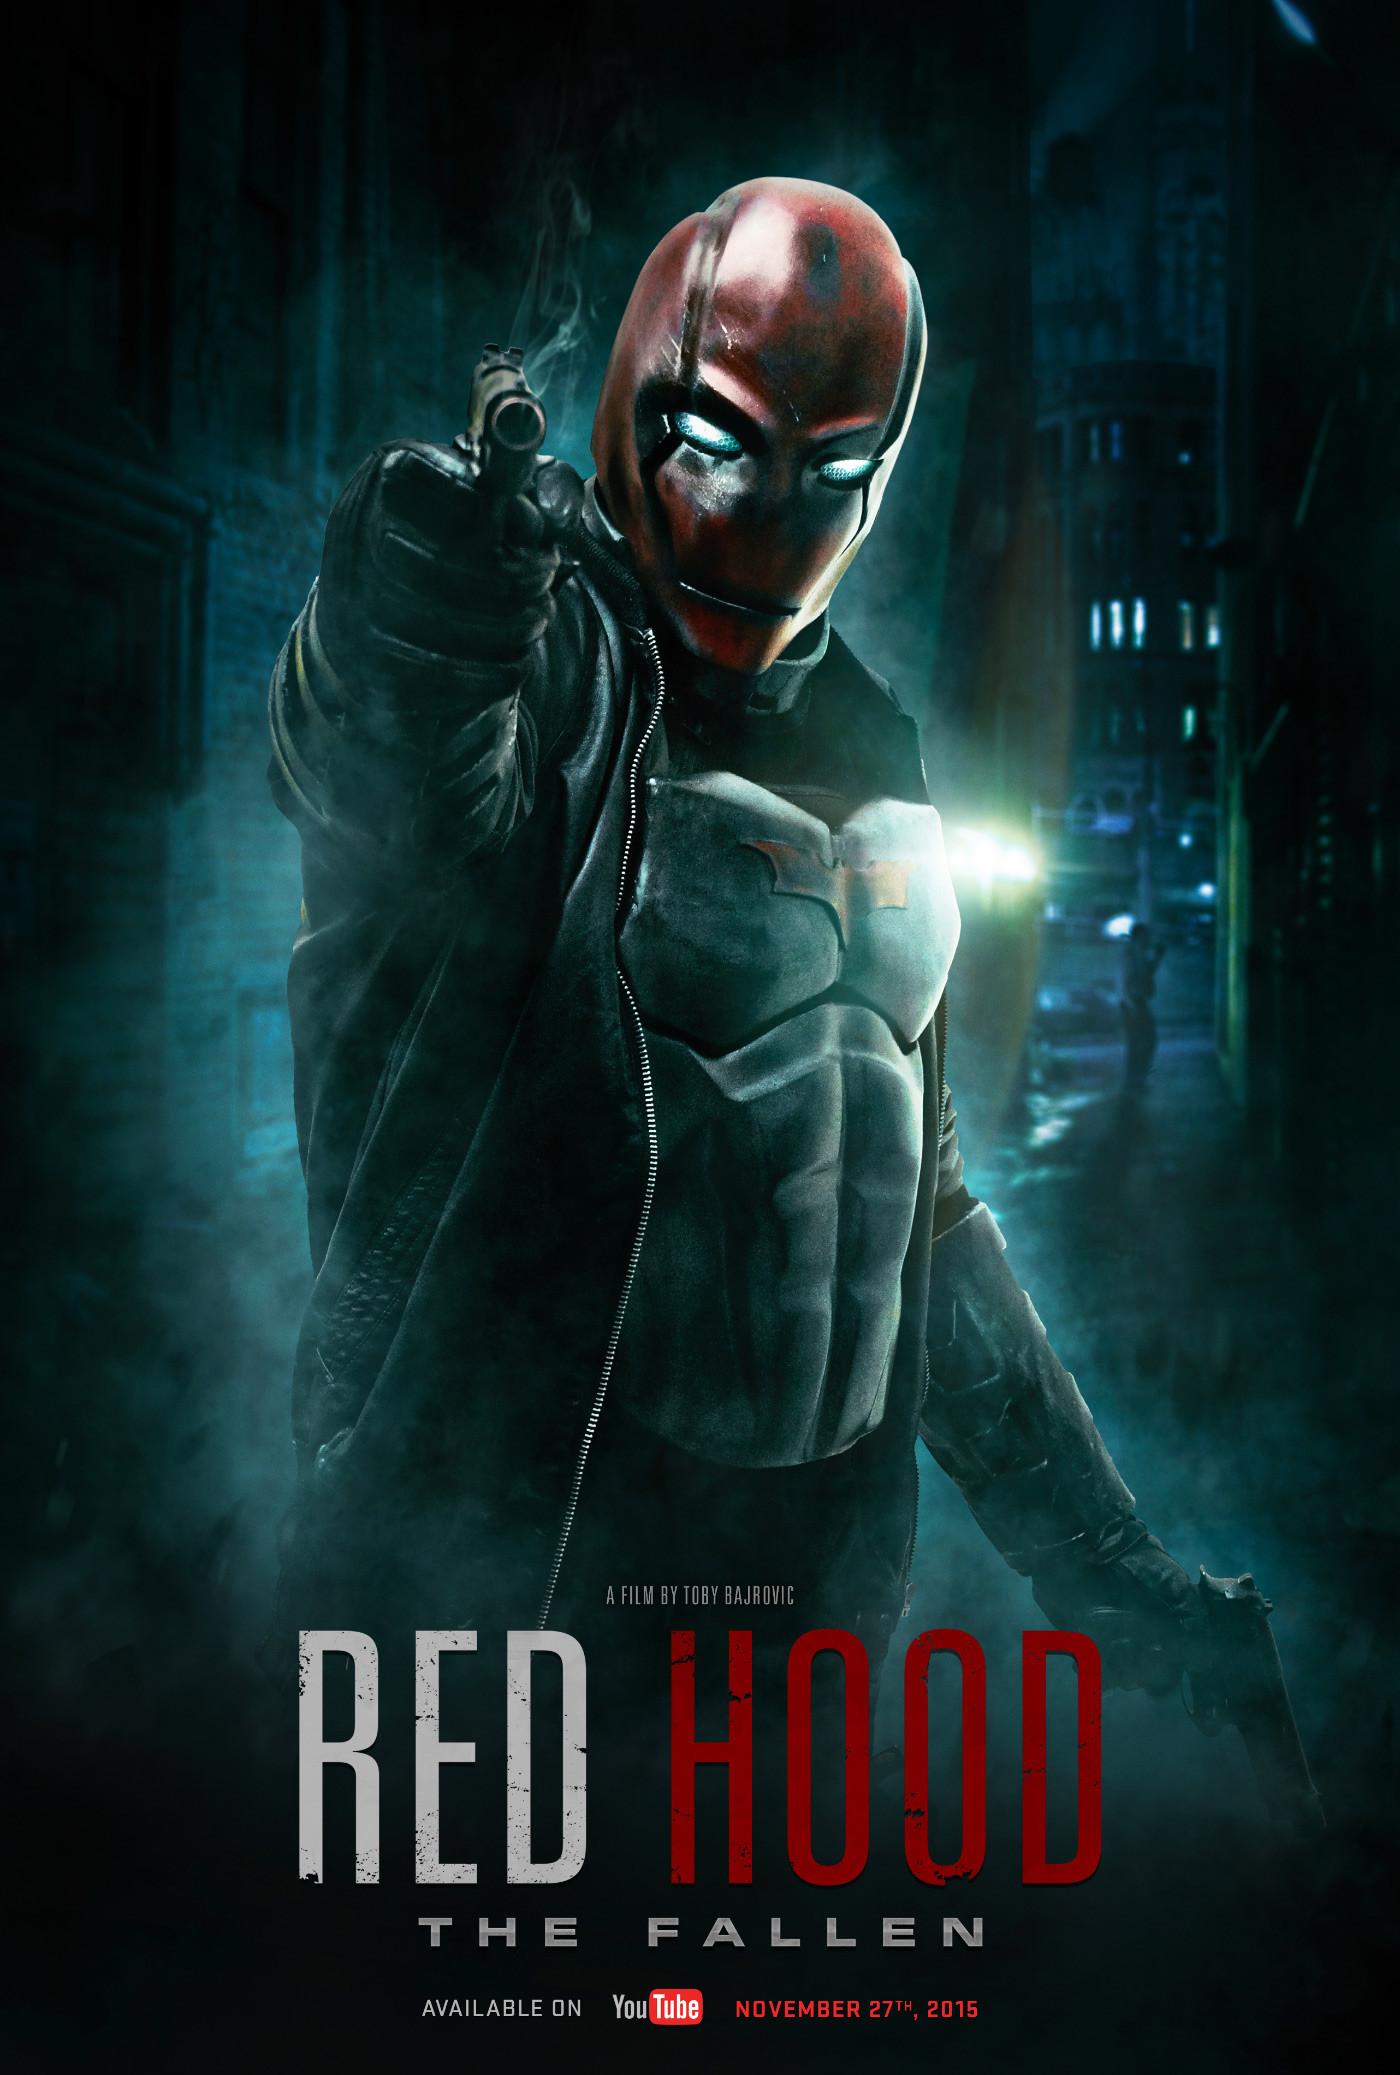 Watch movies like Red Hood: The Fallen